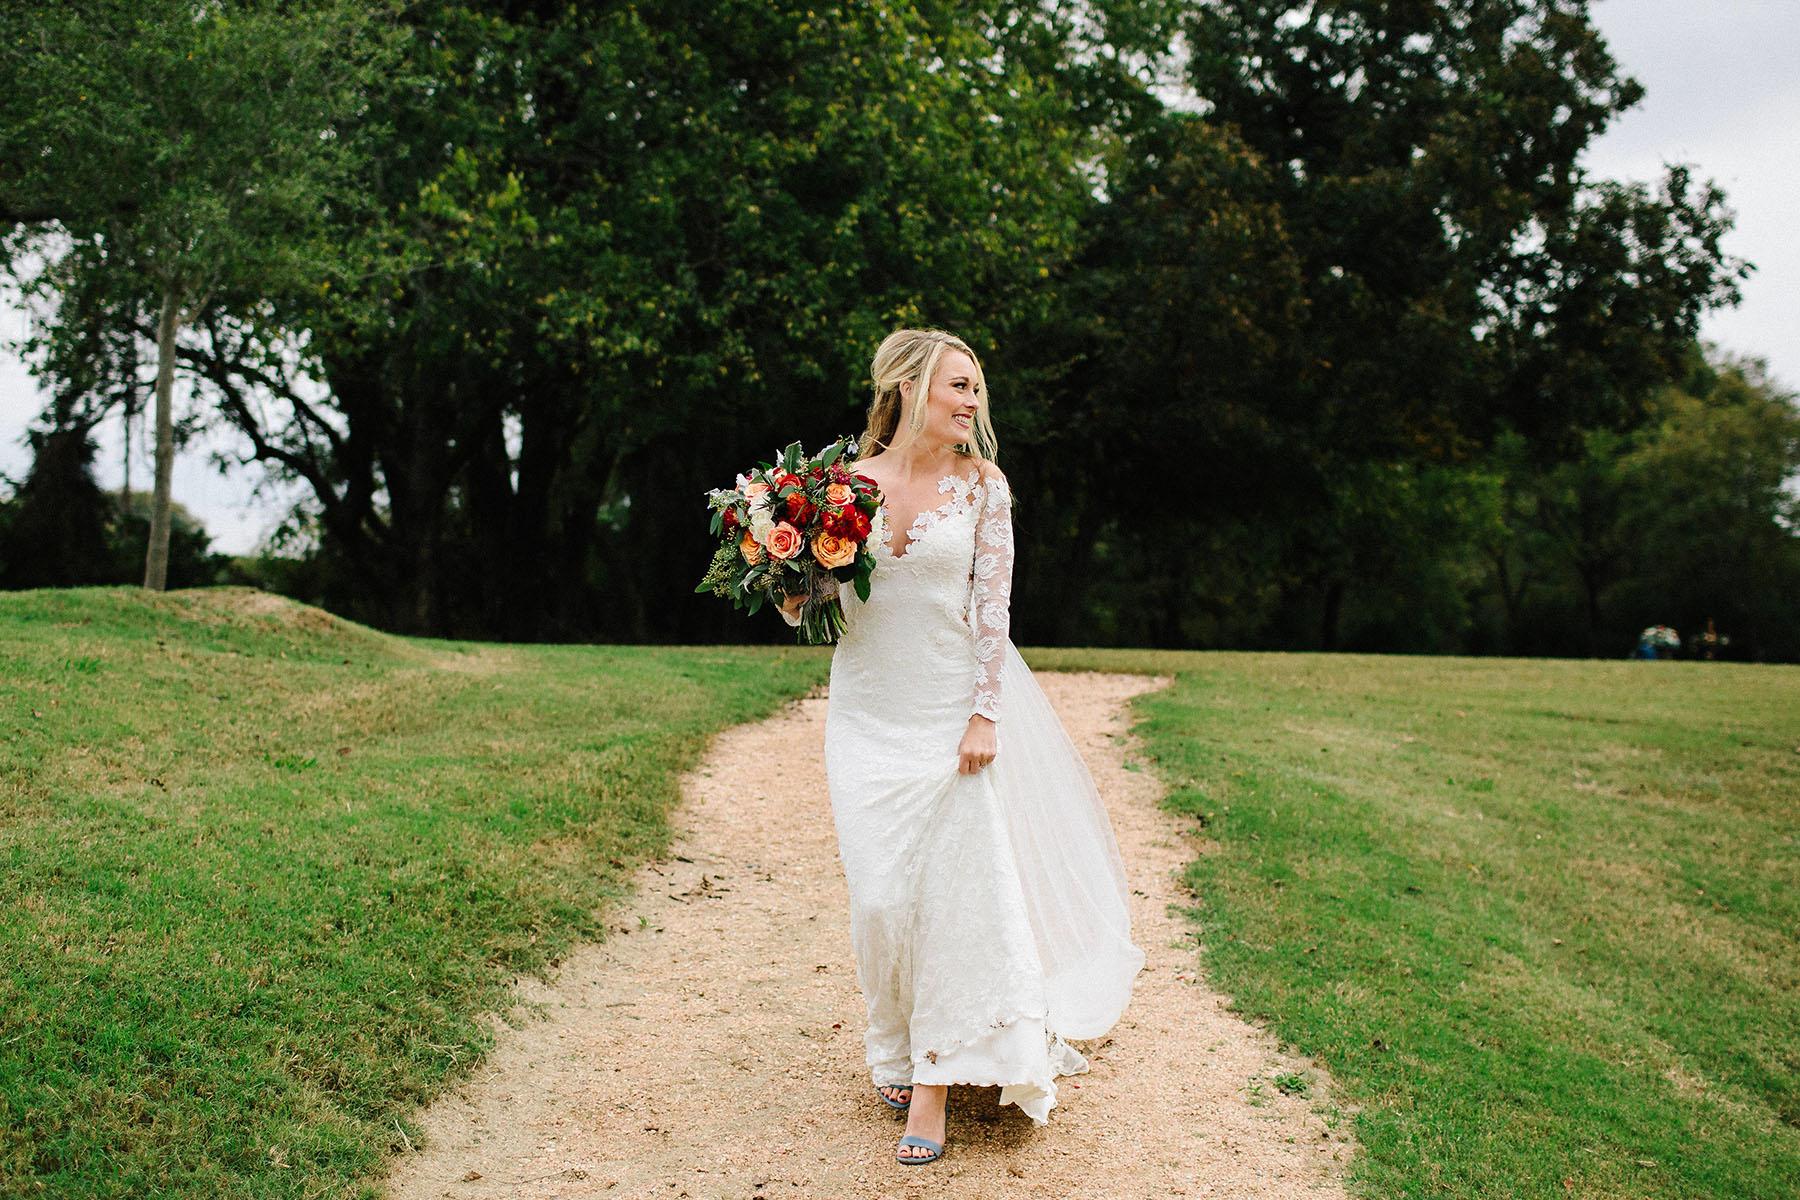 lauren_chad_wedding-90.jpg